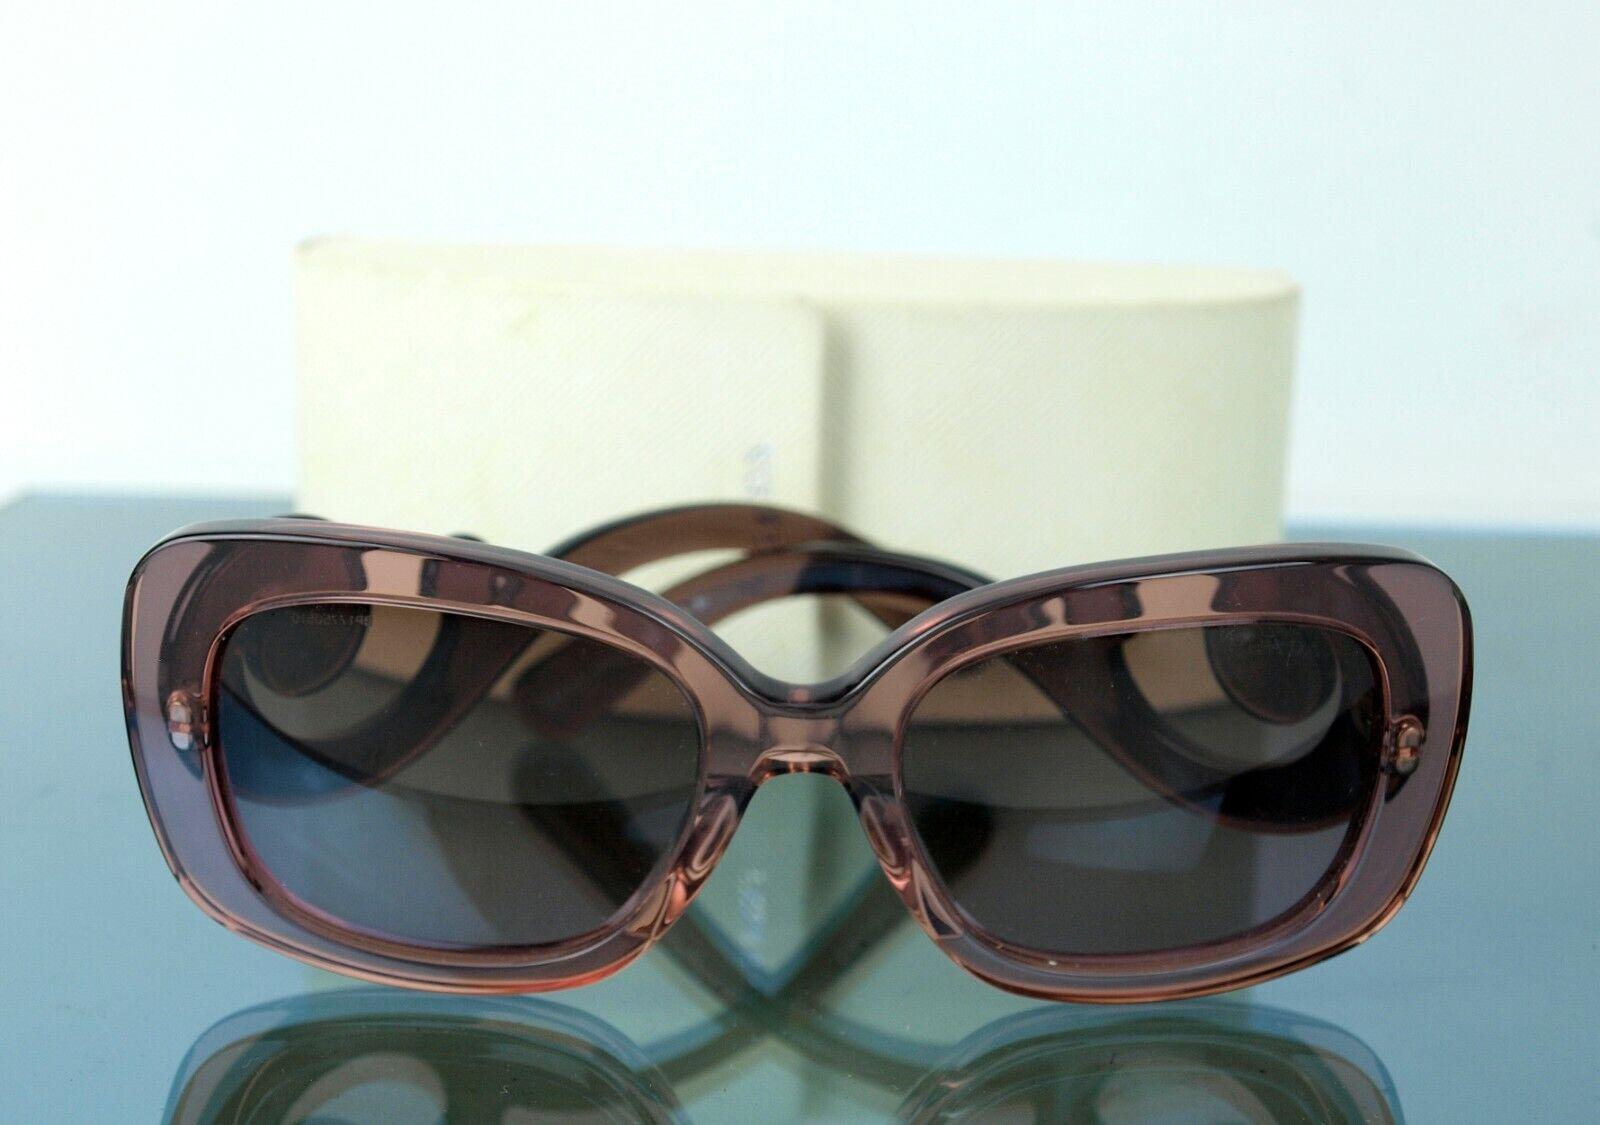 Authentic Prada Acetate Peach Brown Sunglasses SPR 270-A Size 54✖19✖135 Italy